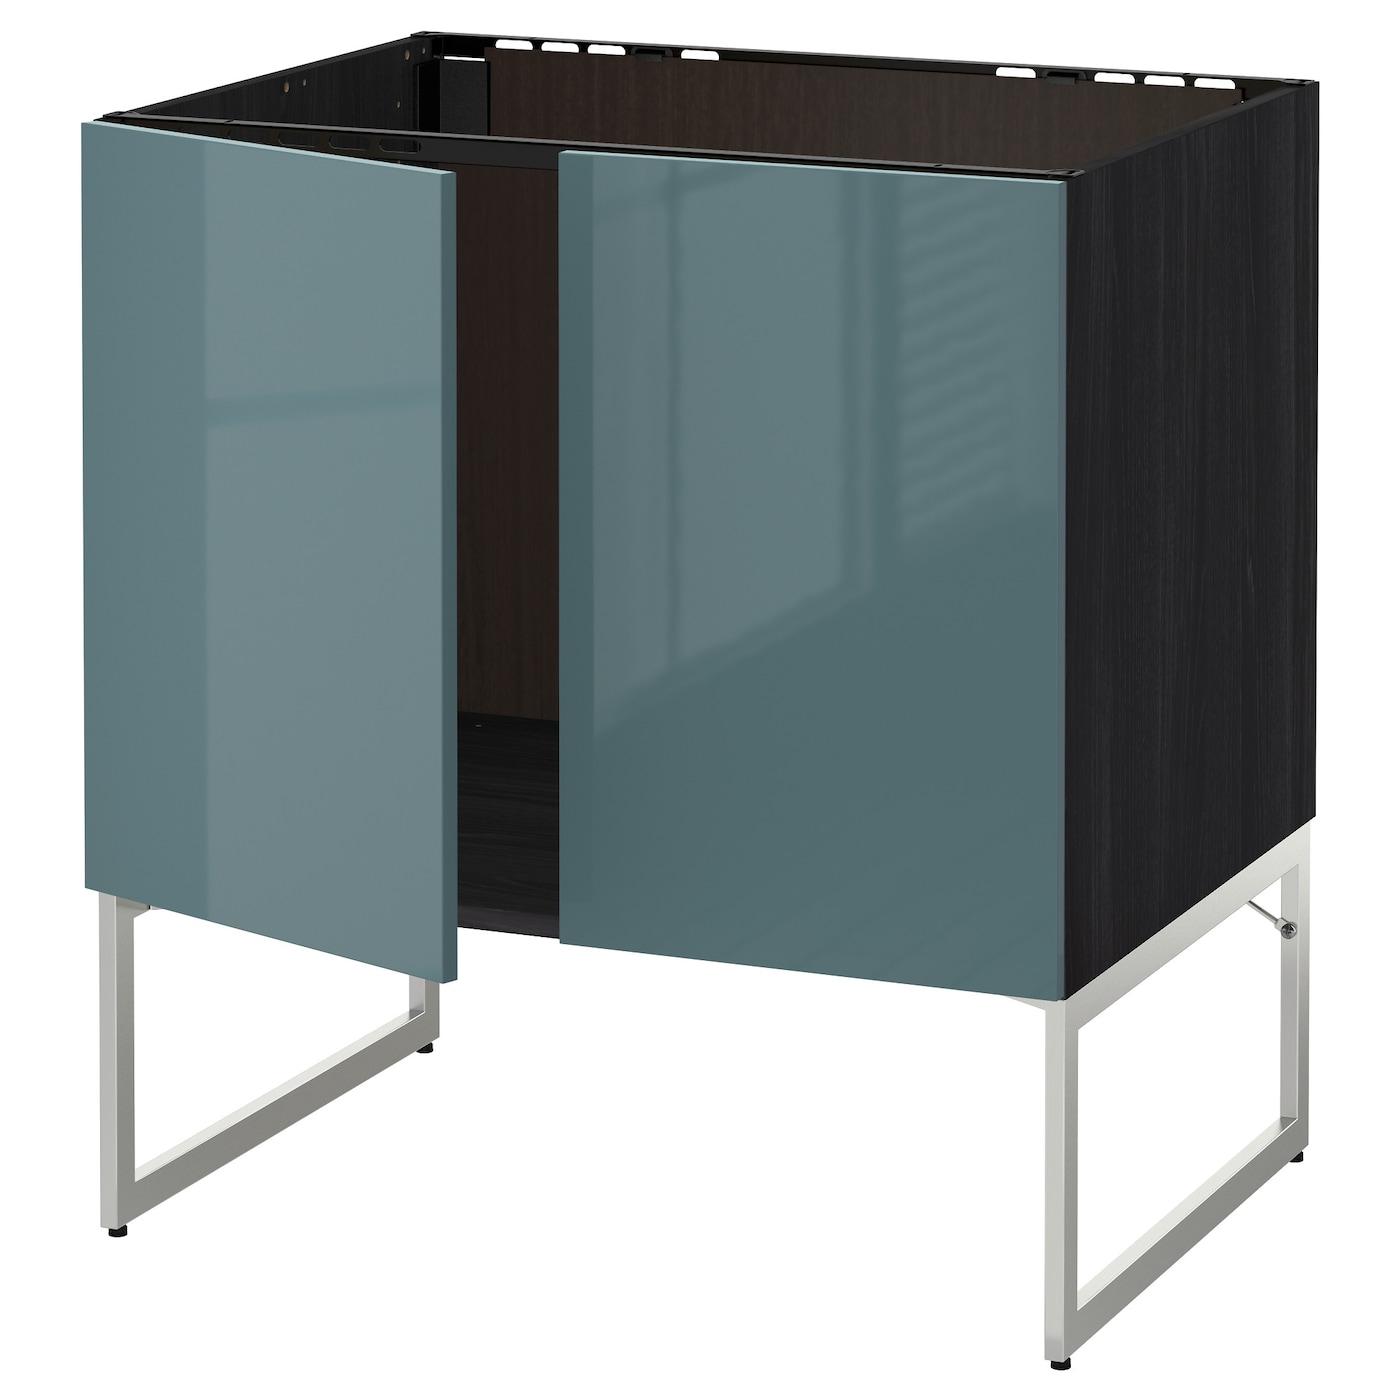 Ikea Kitchen Cabinet Construction: METOD Base Cabinet For Sink + 2 Doors Black/kallarp Grey